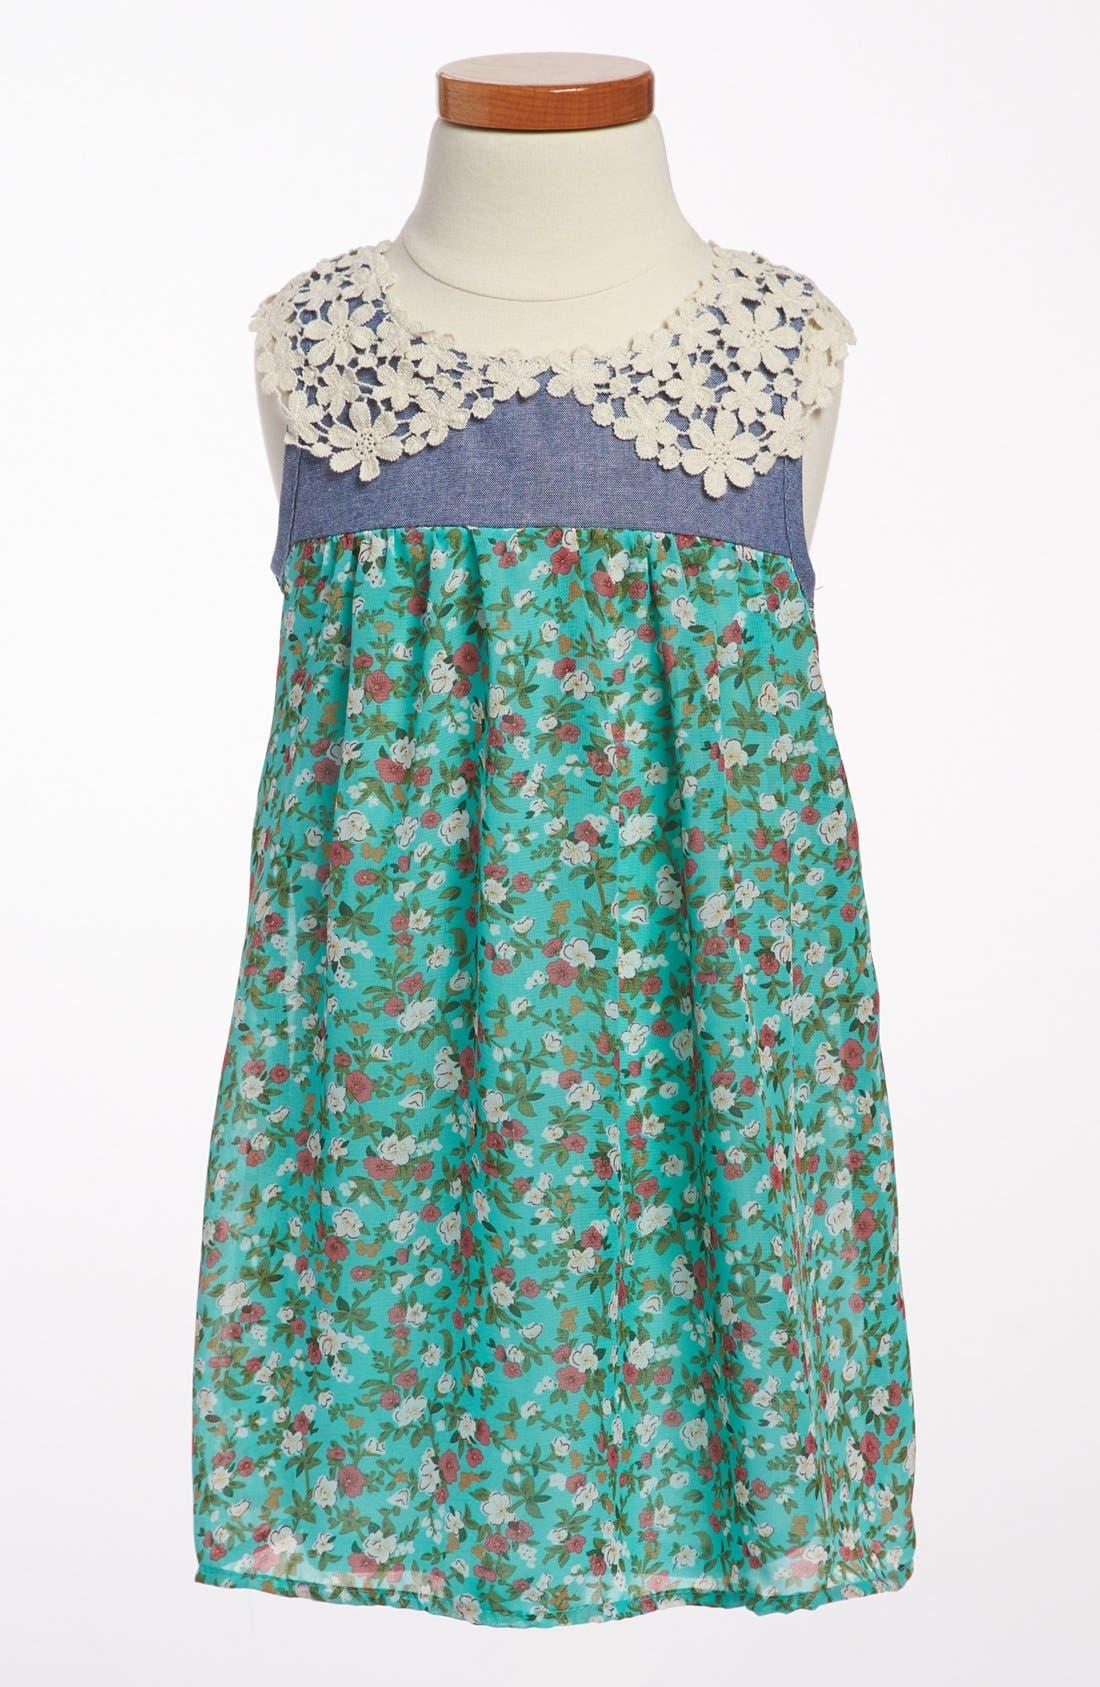 Alternate Image 1 Selected - Jenna & Jessie 'Ditsy Floral' Chiffon Dress (Toddler Girls)